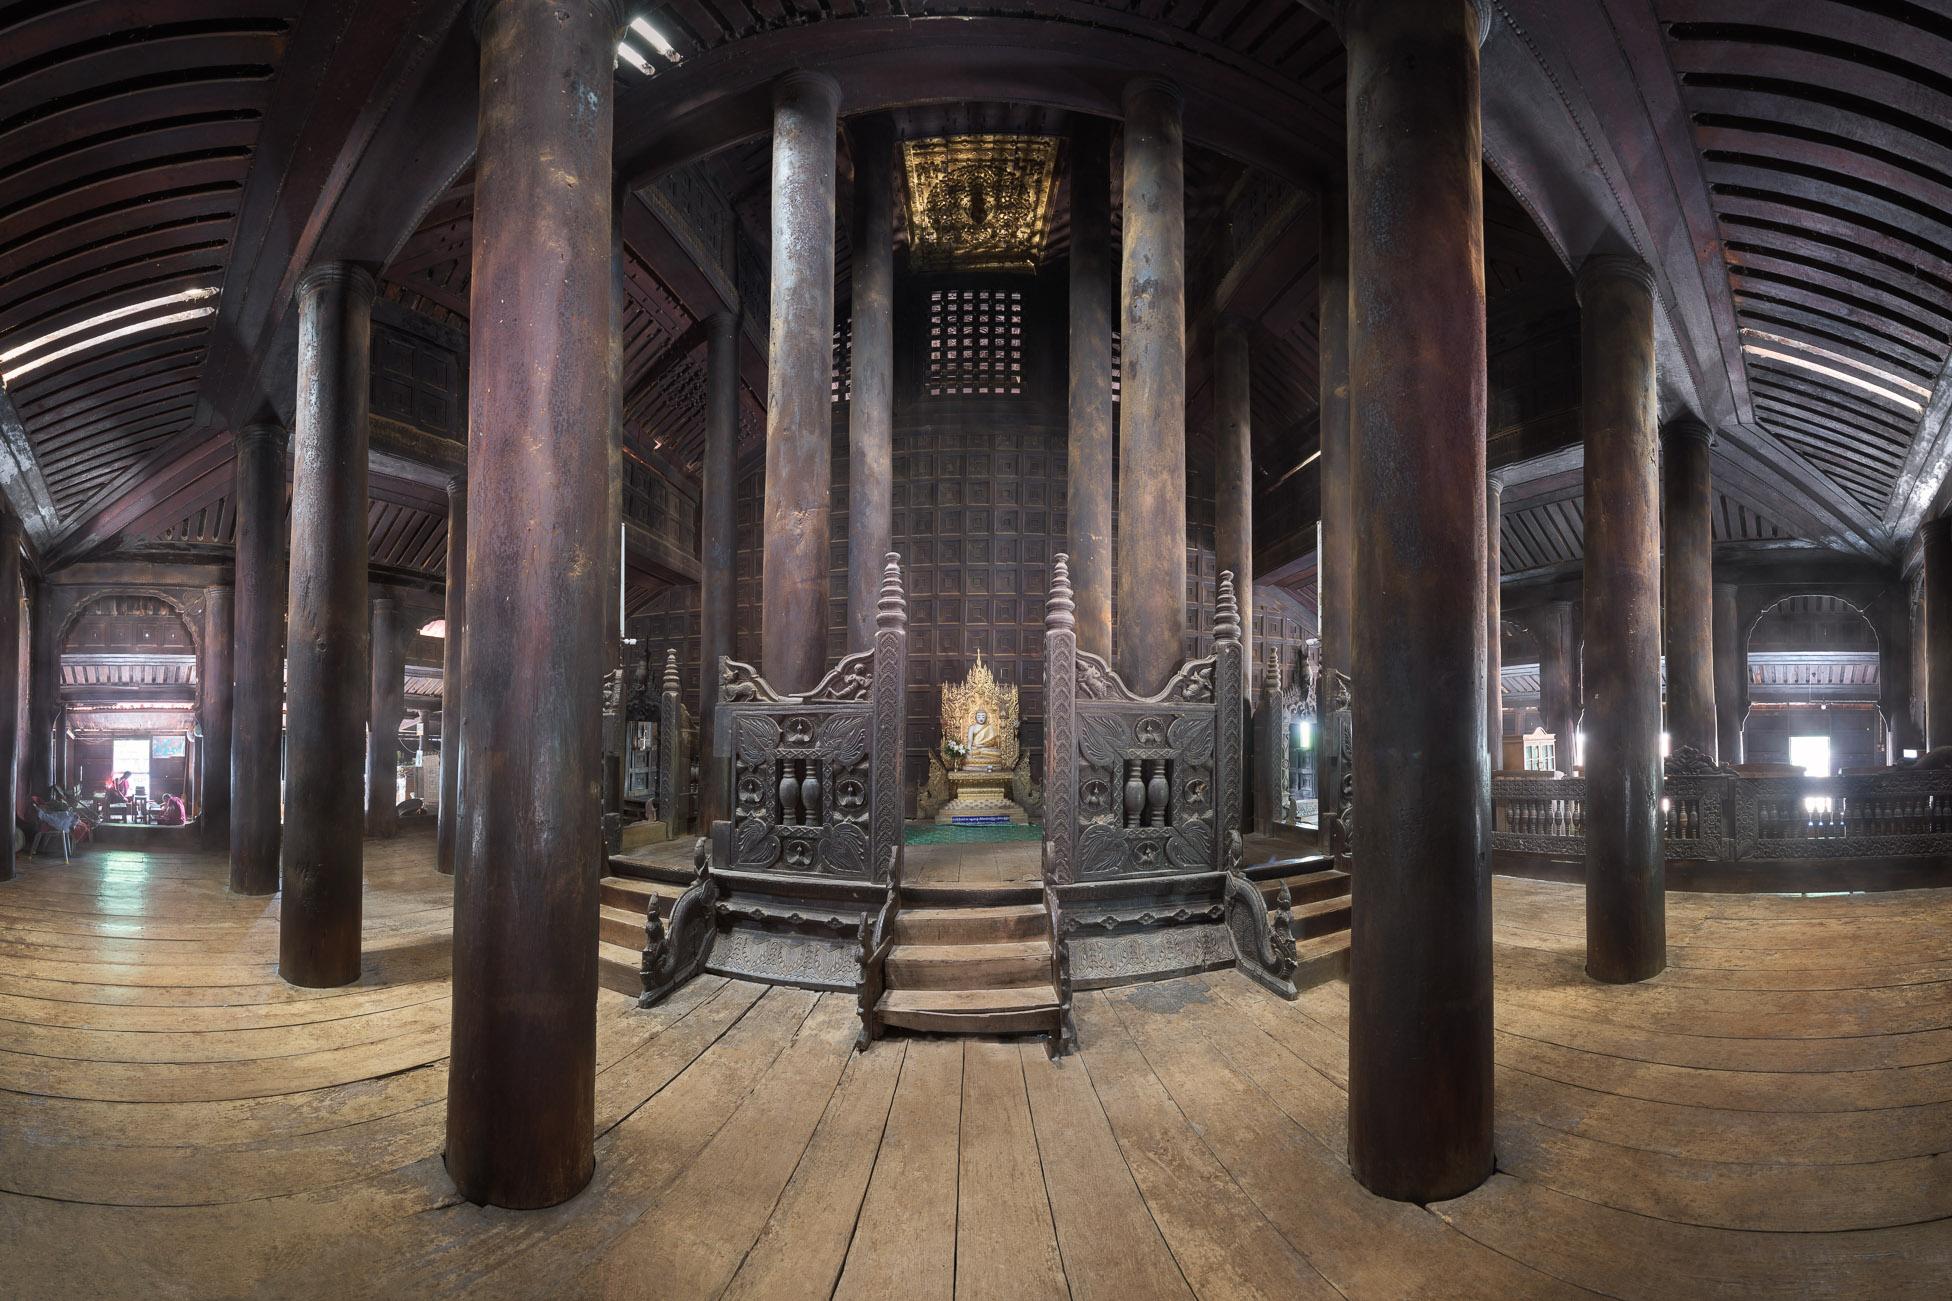 Teak Wood Interior of Bagaya Monastery, Inwa, Myanmar